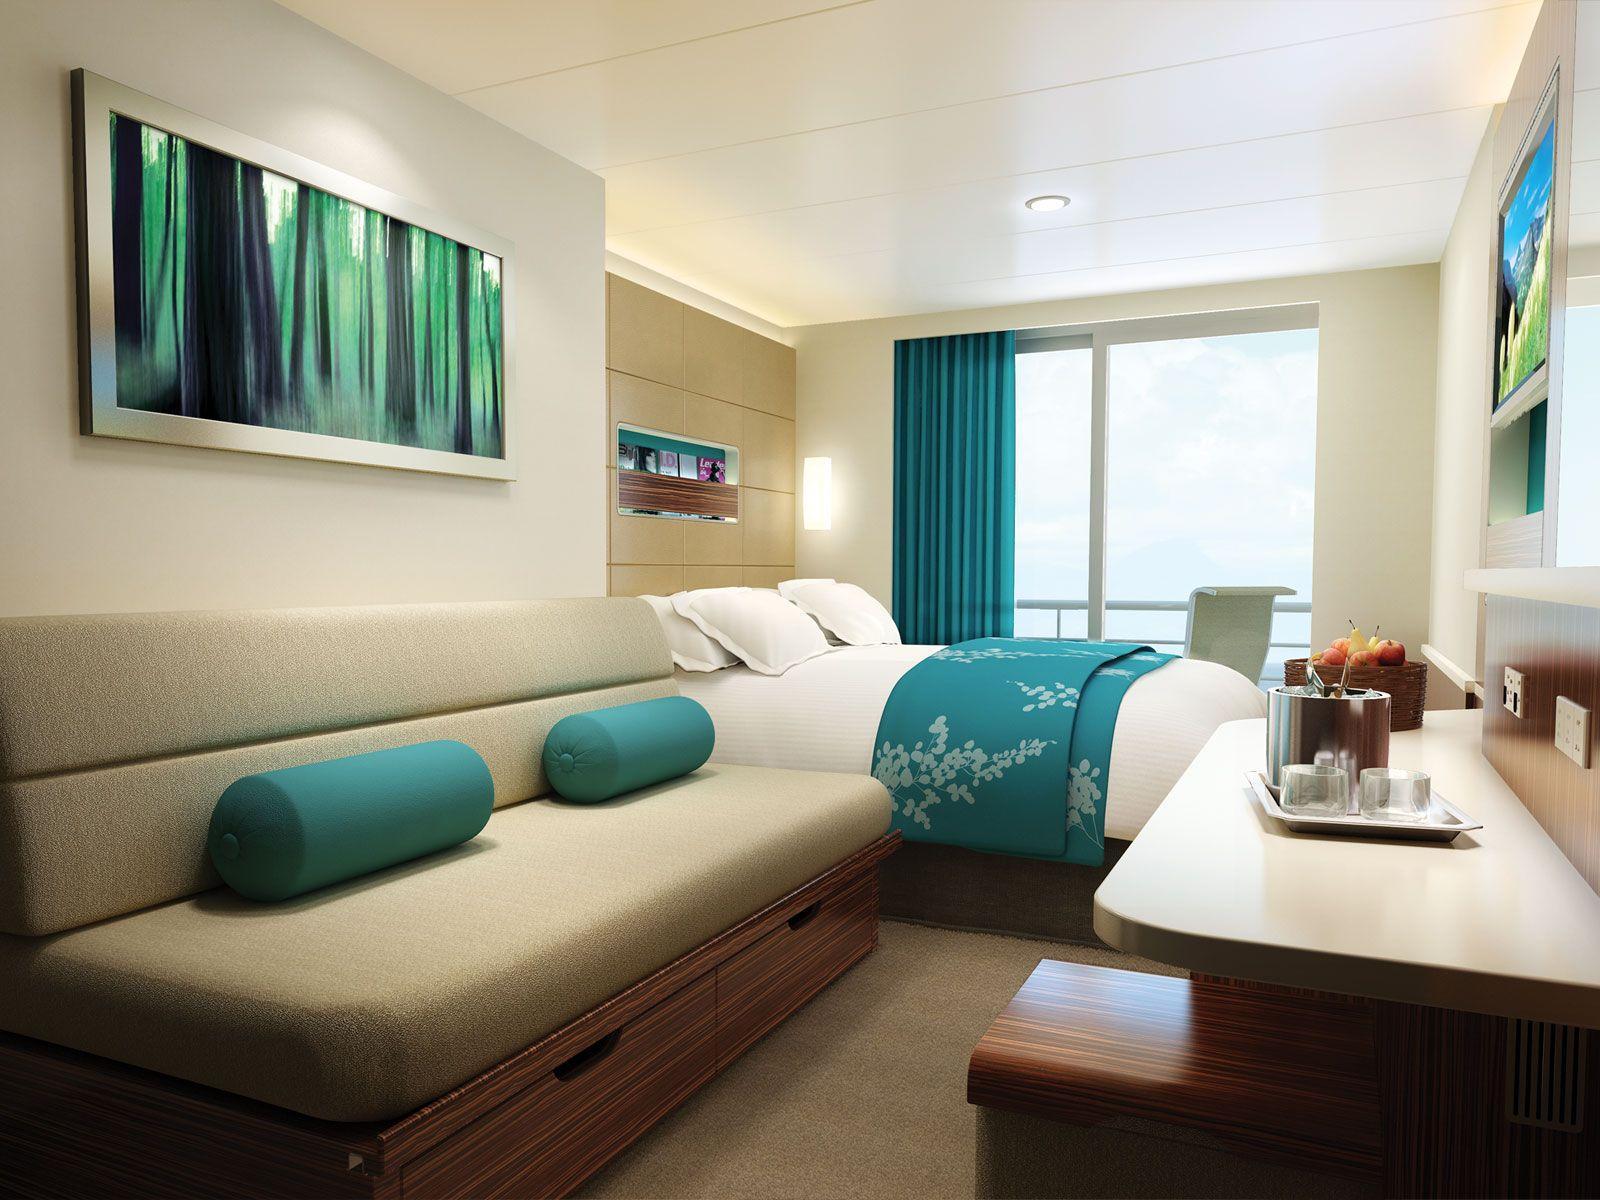 Norwegian Breakaway Balcony Stateroom Norwegian Cruise